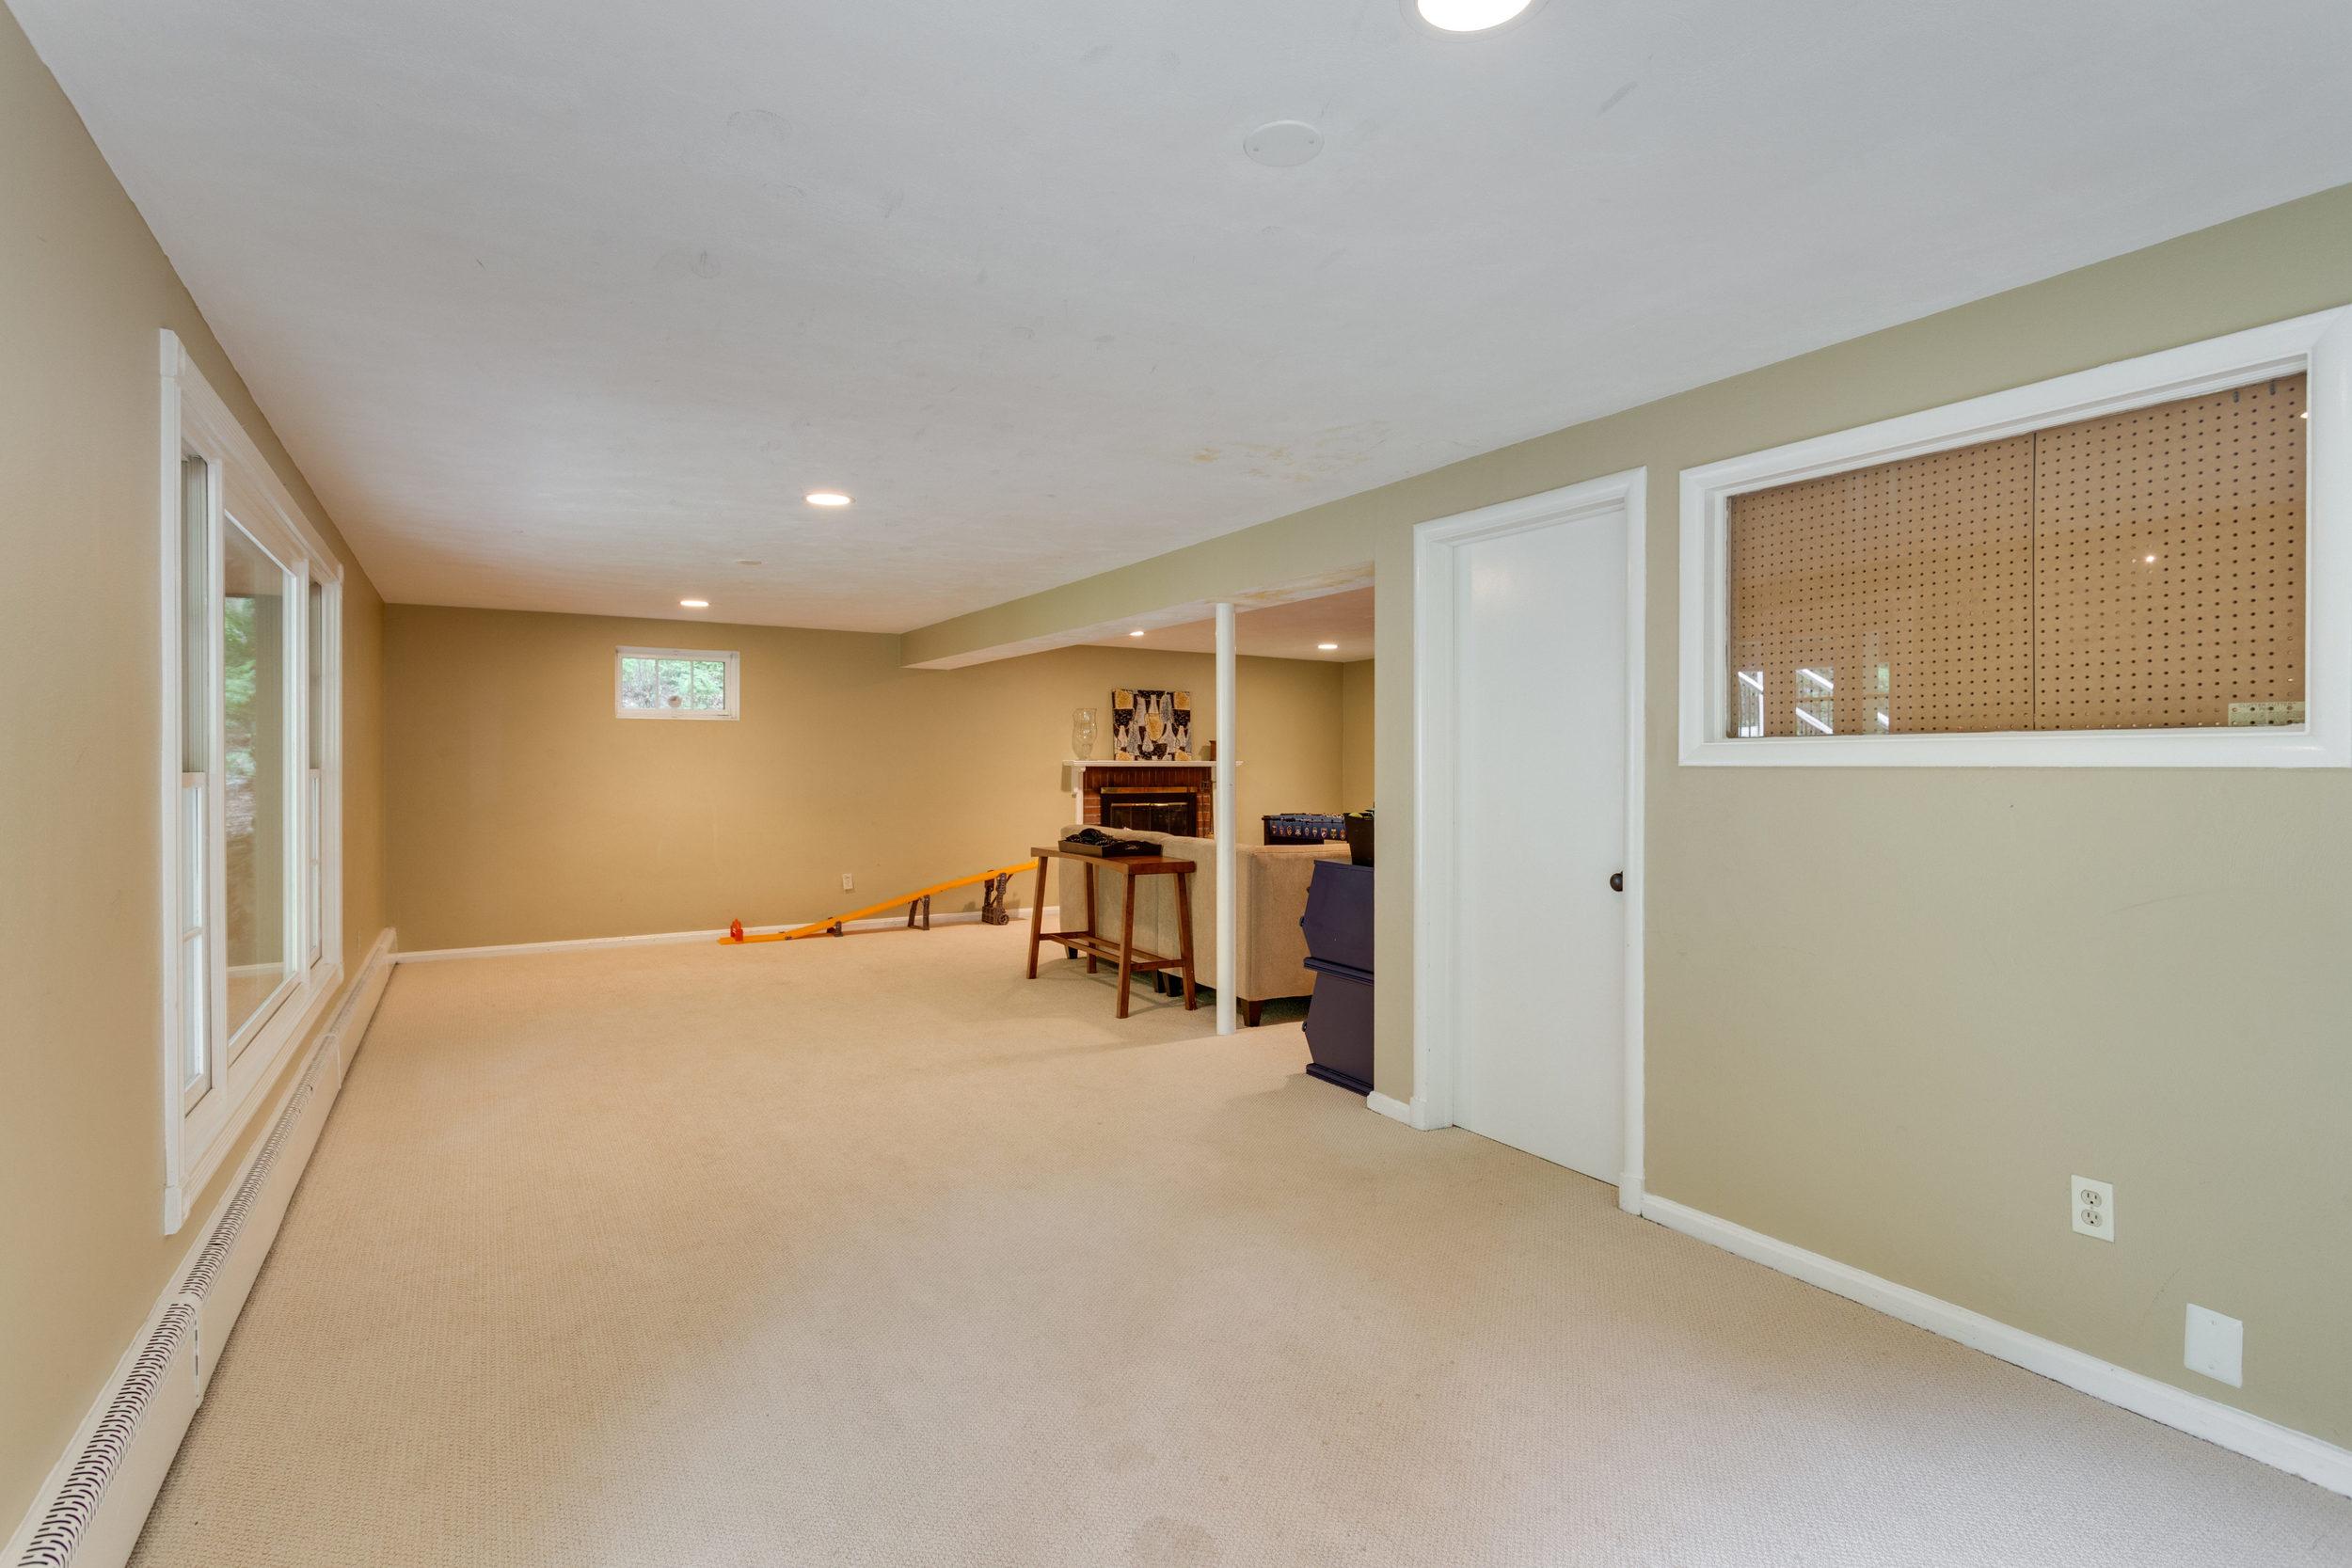 1519 Crestwood Ln McLean VA-print-039-39-Recreation Room-4200x2800-300dpi.jpg